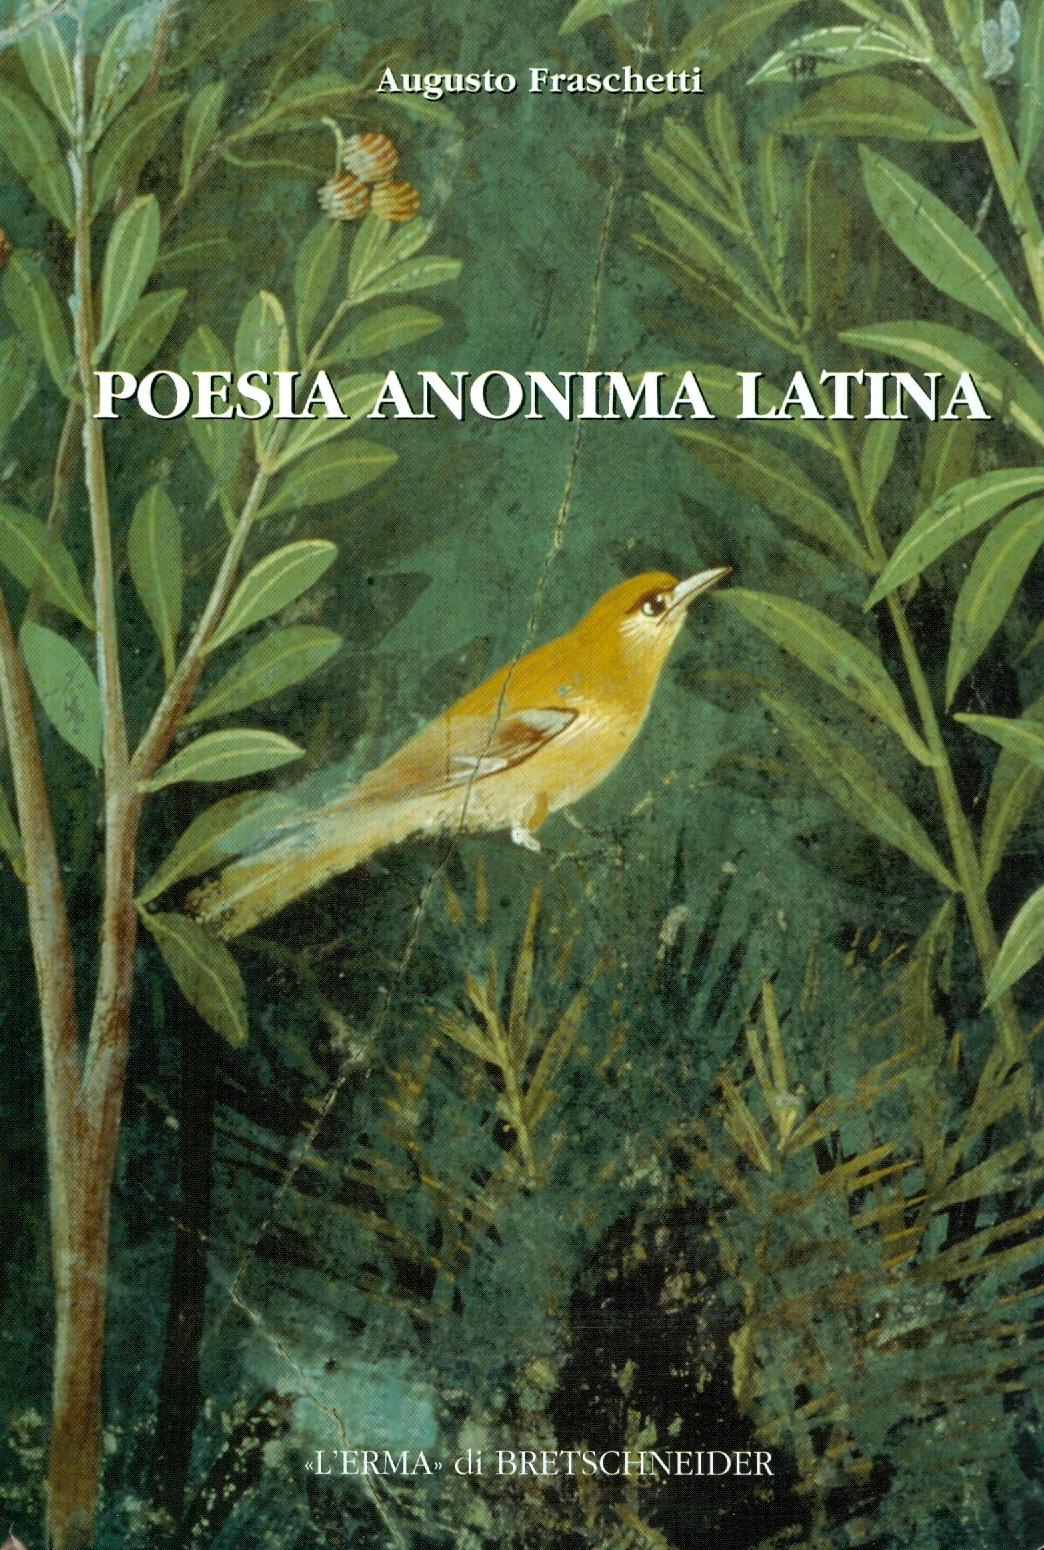 Poesia anonima latina